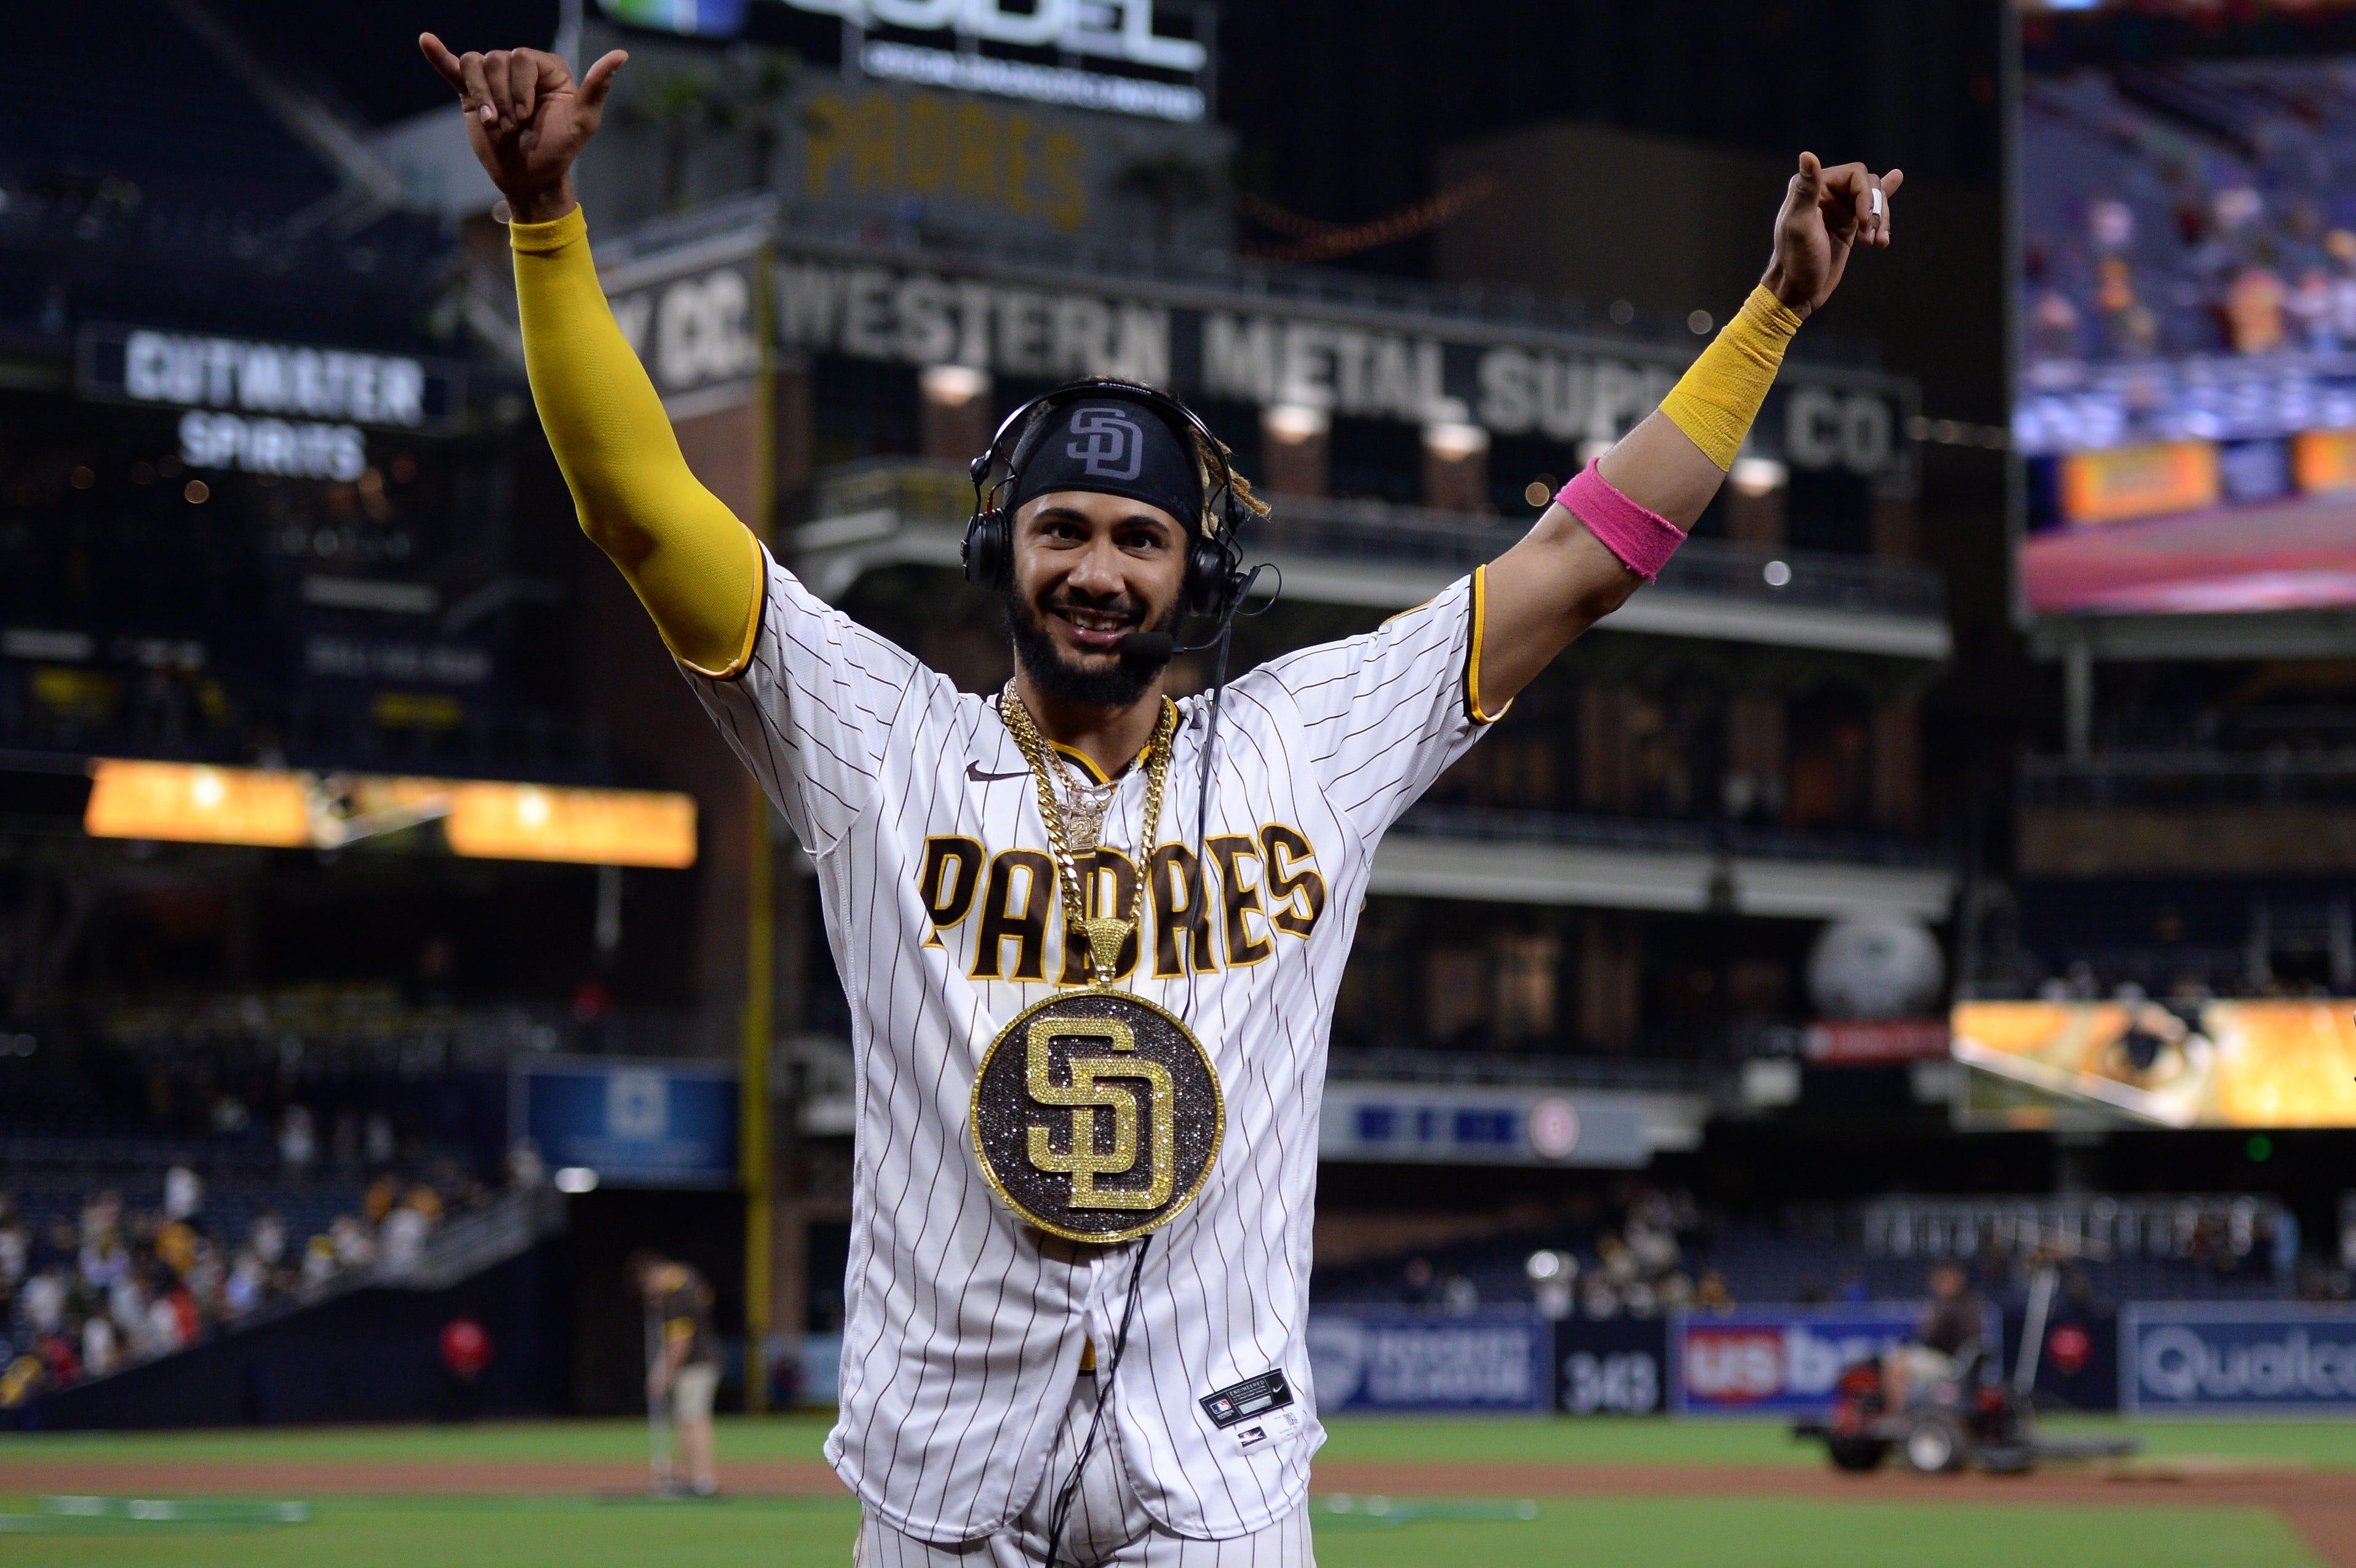 2021 MLB All-Star Game starters: Shohei Ohtani, Fernando Tatis Jr. among baseball s first-time stars